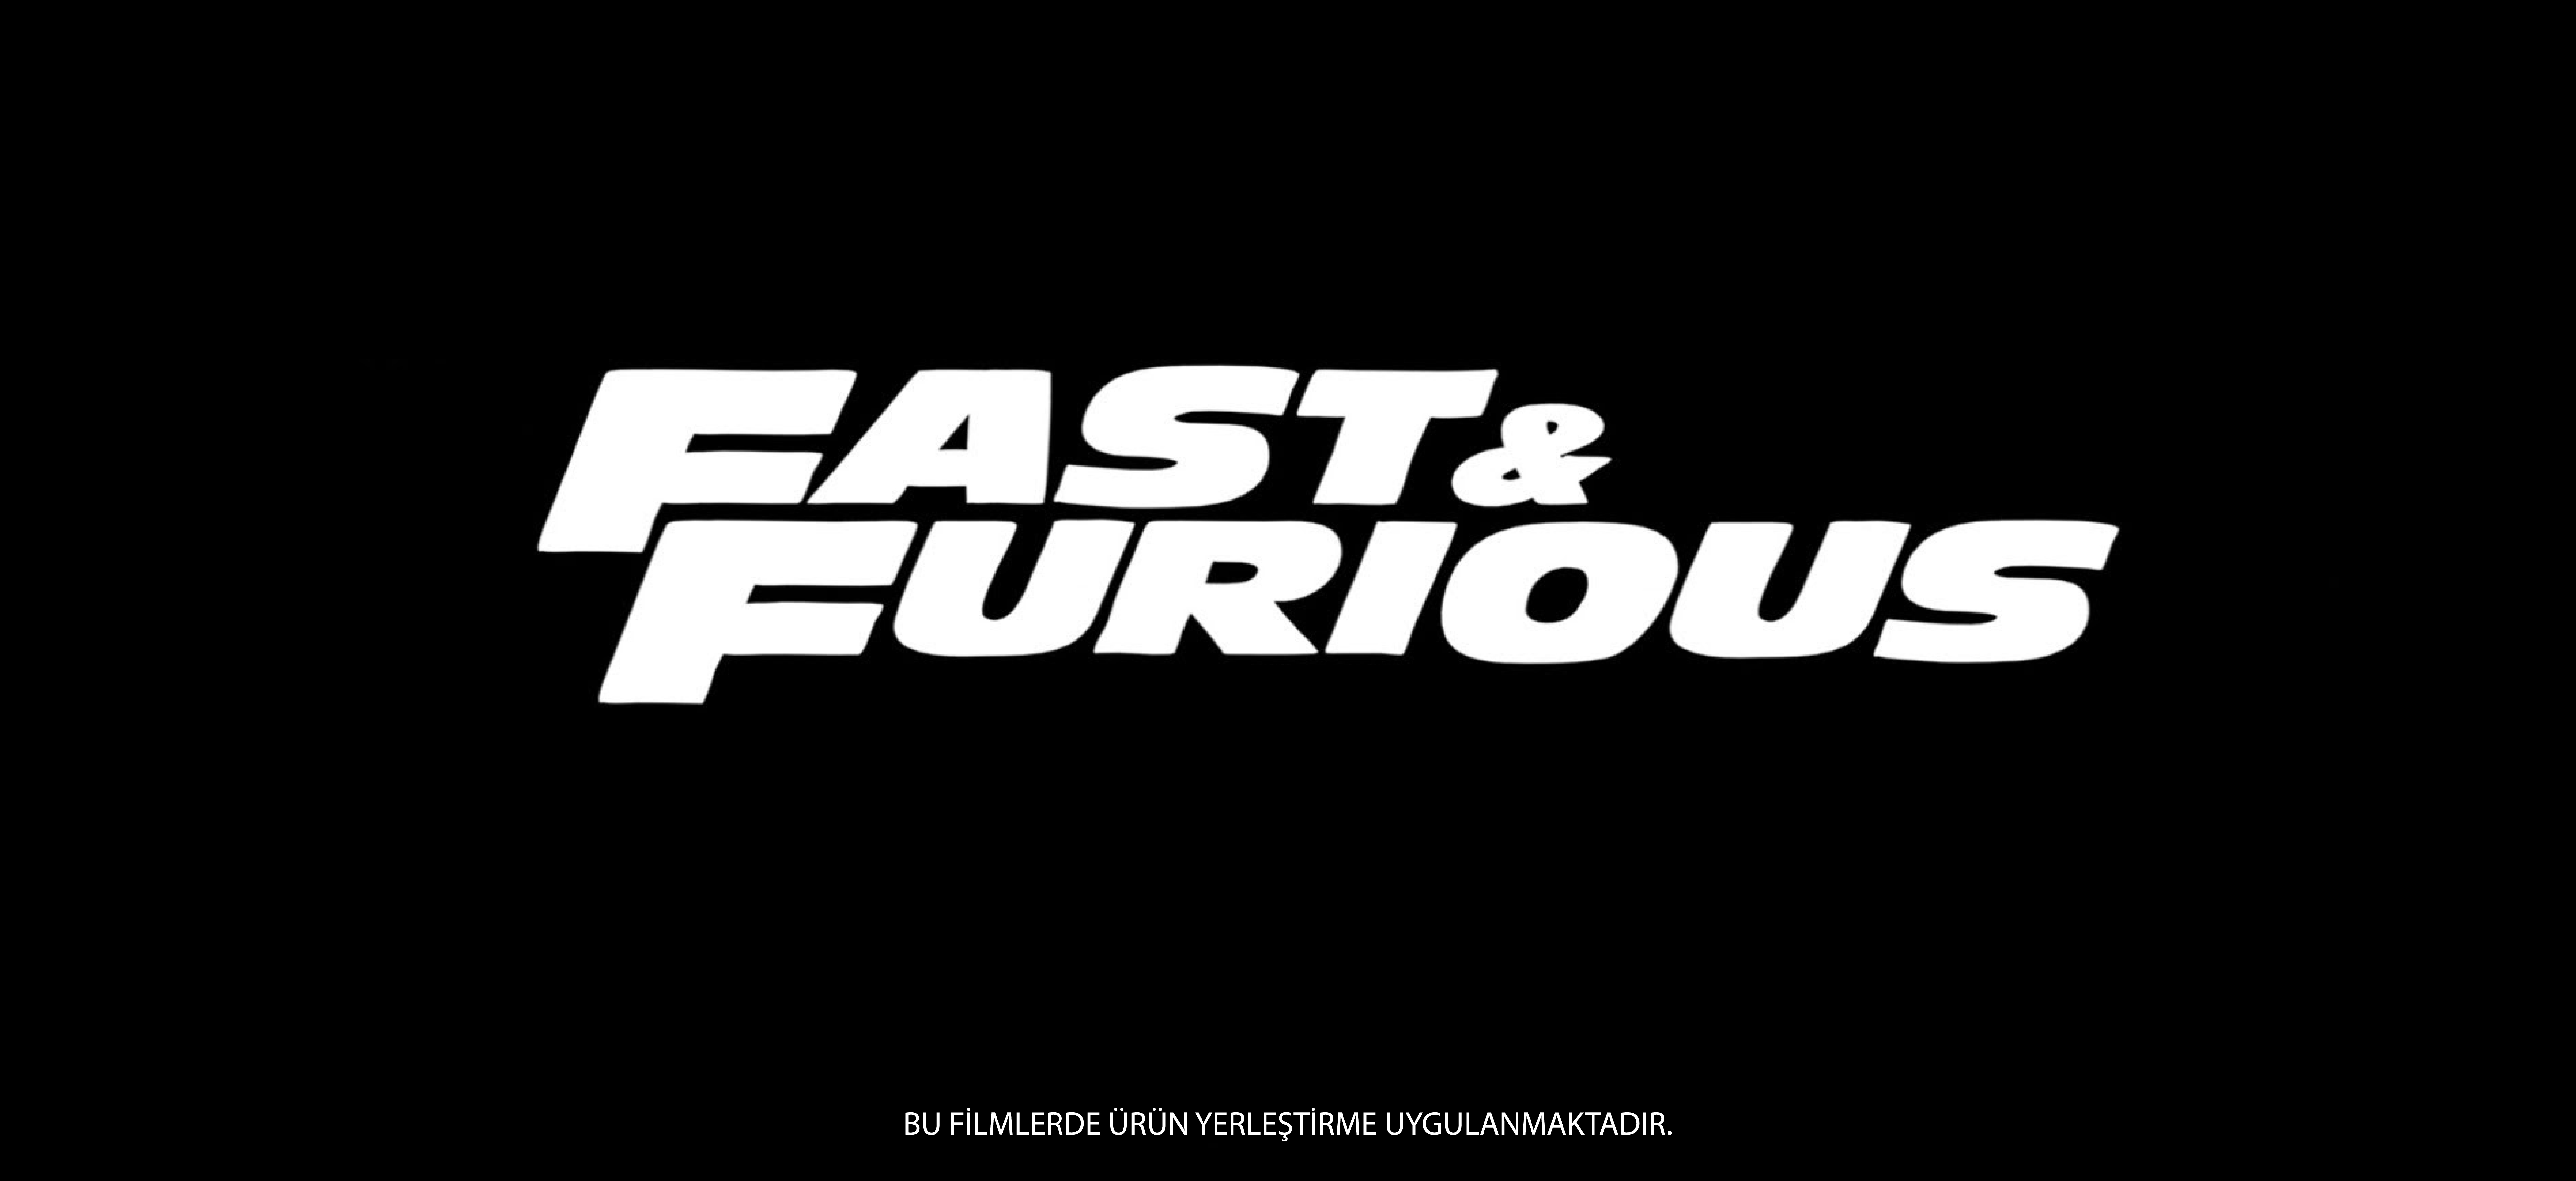 Fast and Furious ve Corona